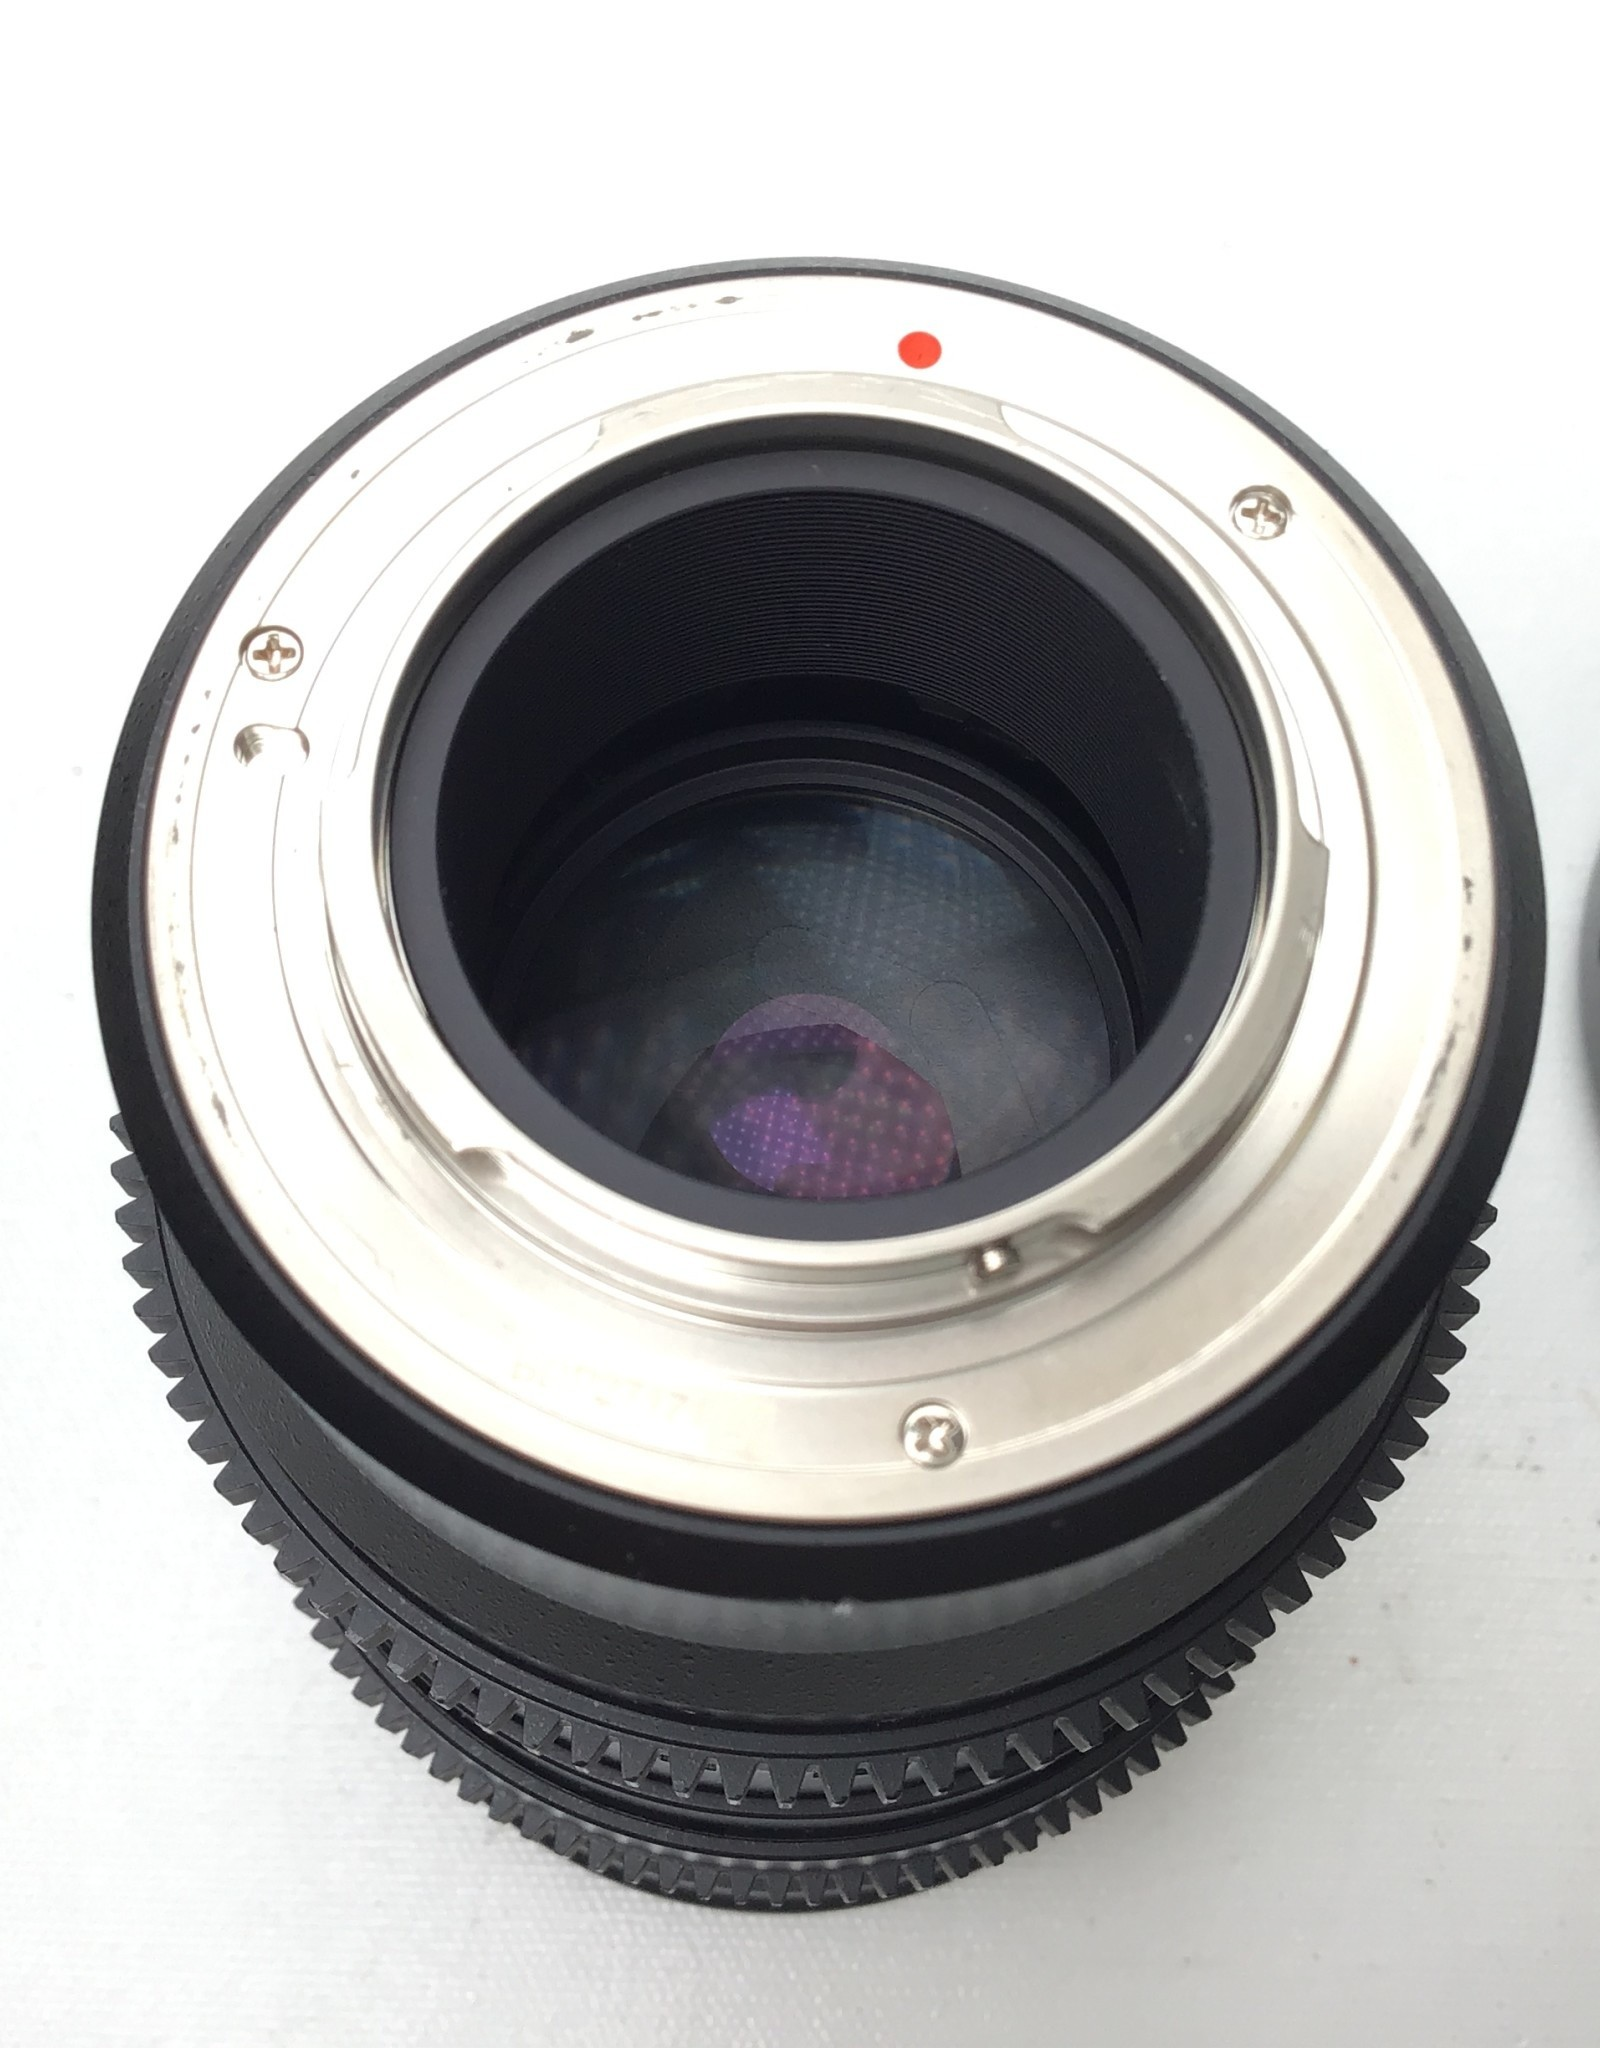 ROKINON Rokinon Cinema AS 35mm T1.5 for MFT Used EX